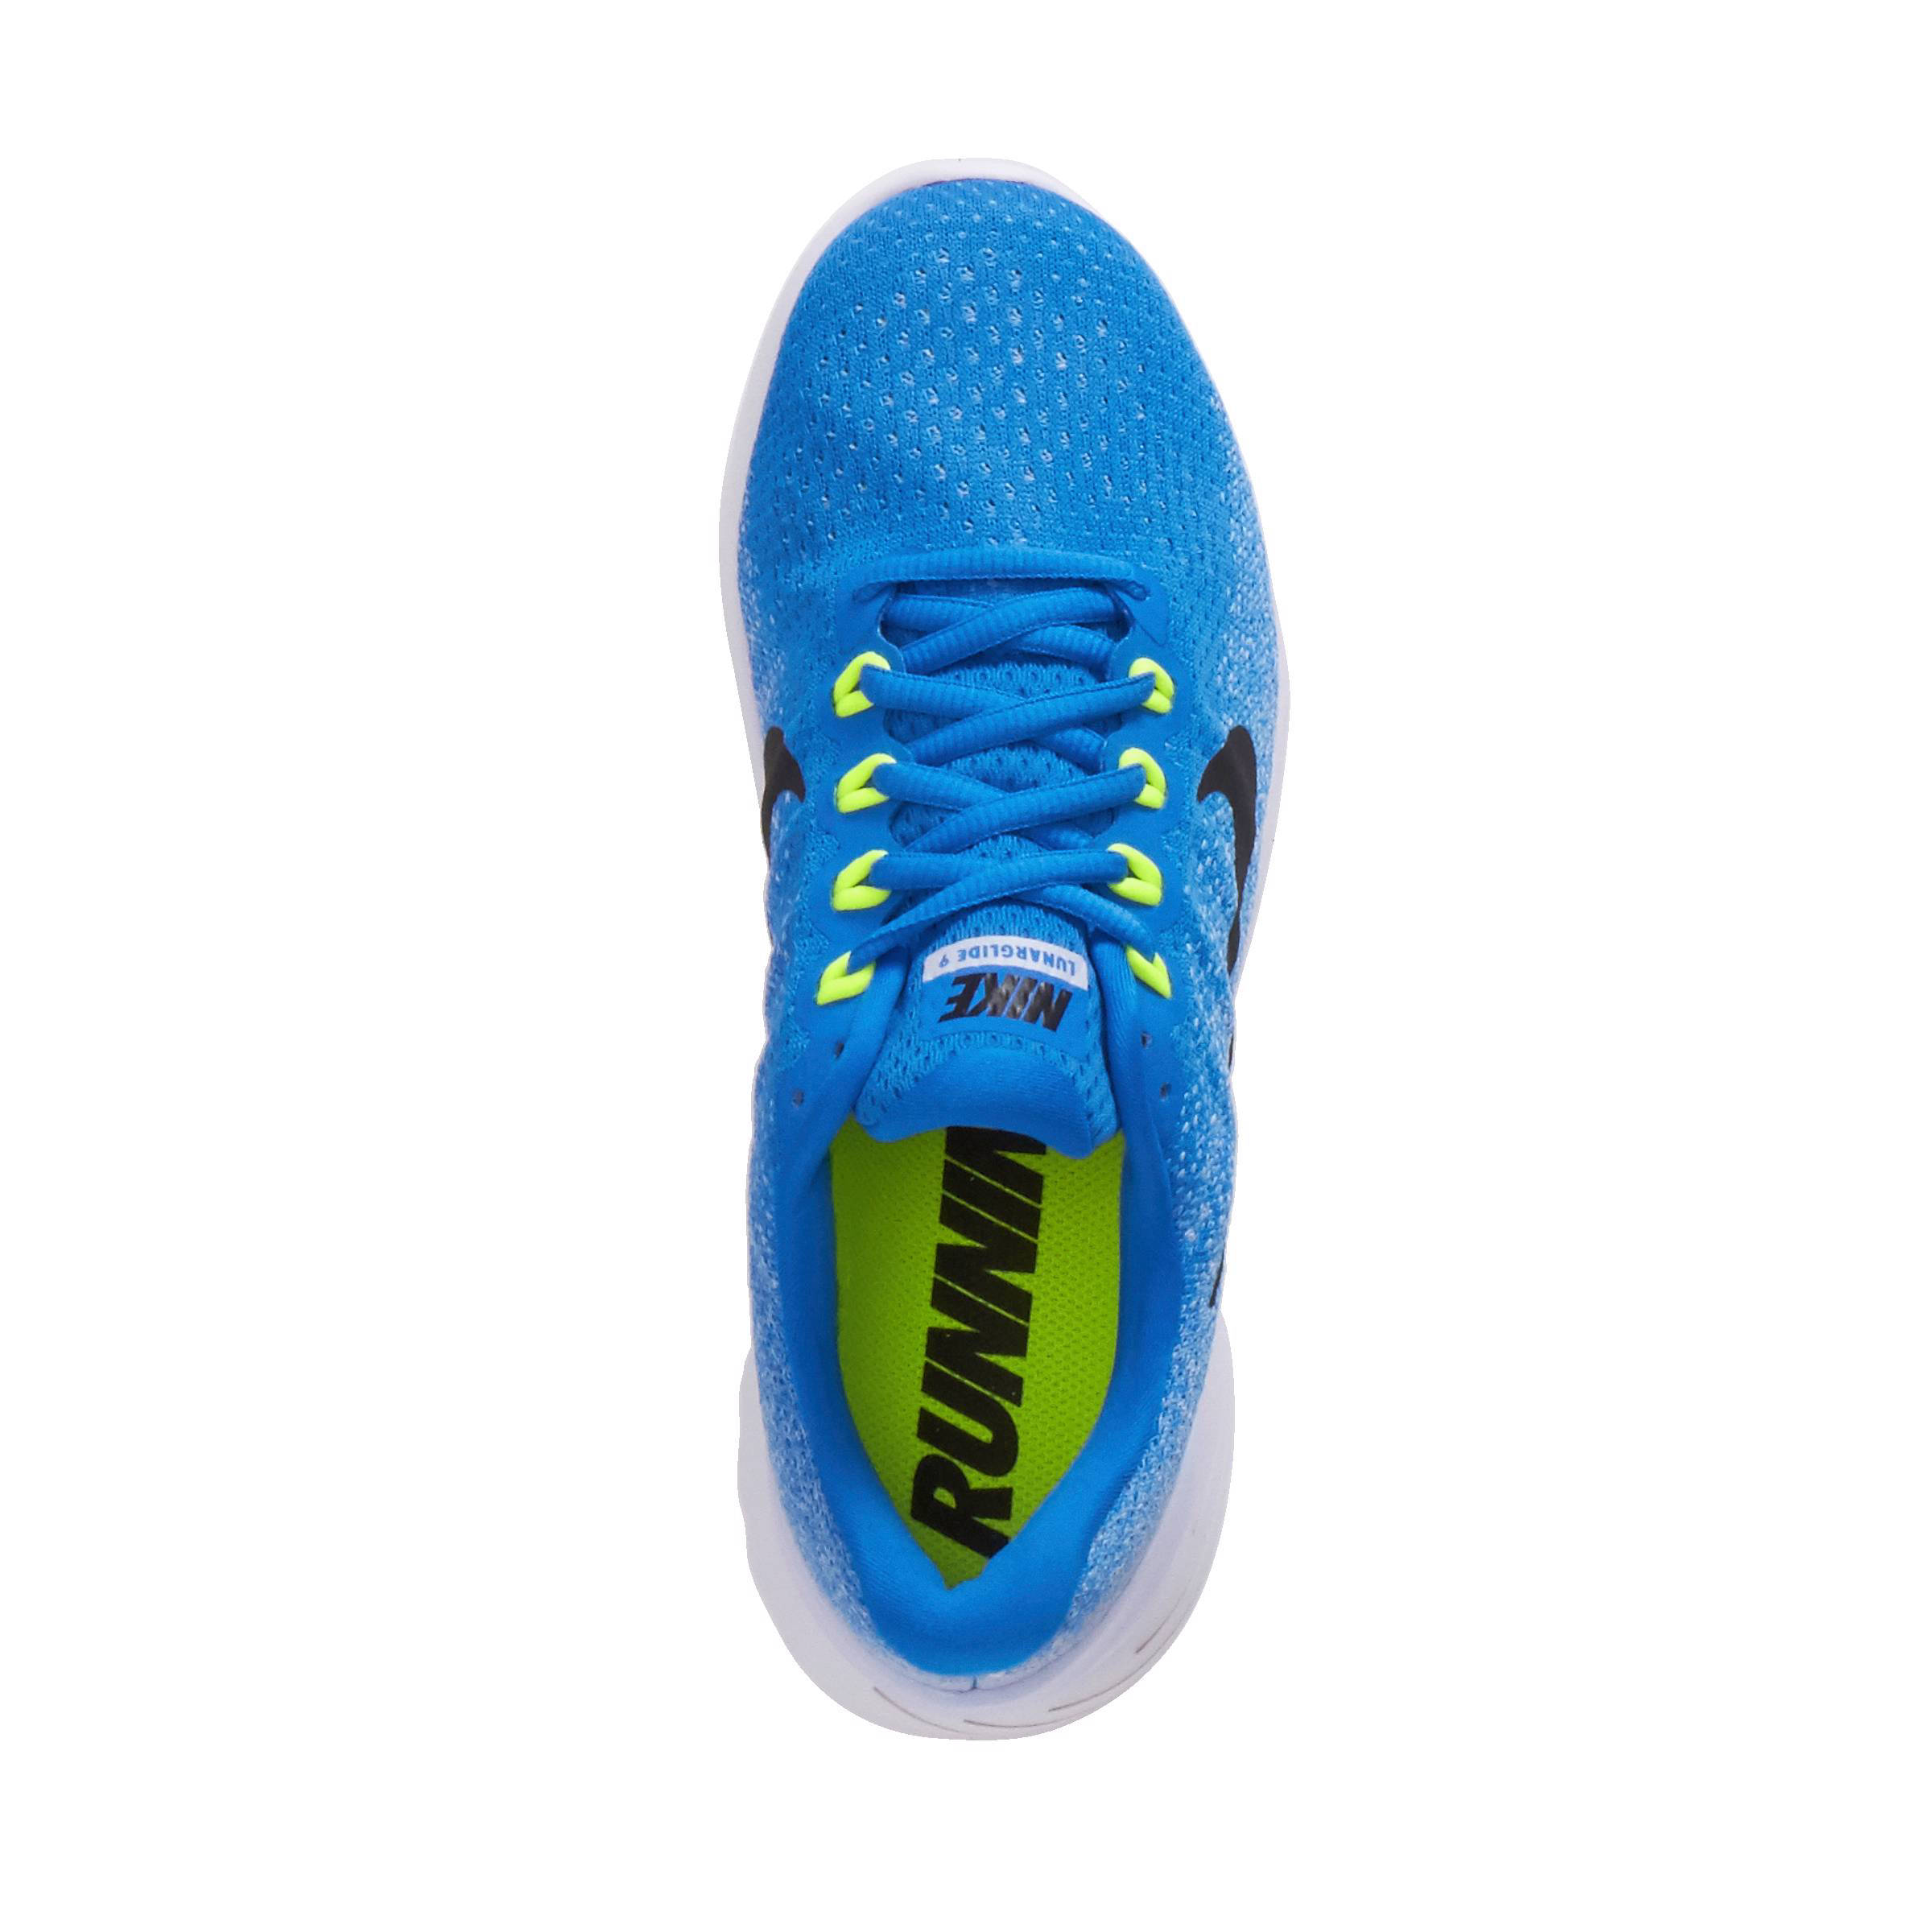 Hardloopschoenen Wehkamp 9 Hardloopschoenen 9 Nike Nike Lunarglide Wehkamp Lunarglide x6fg4ZwqR